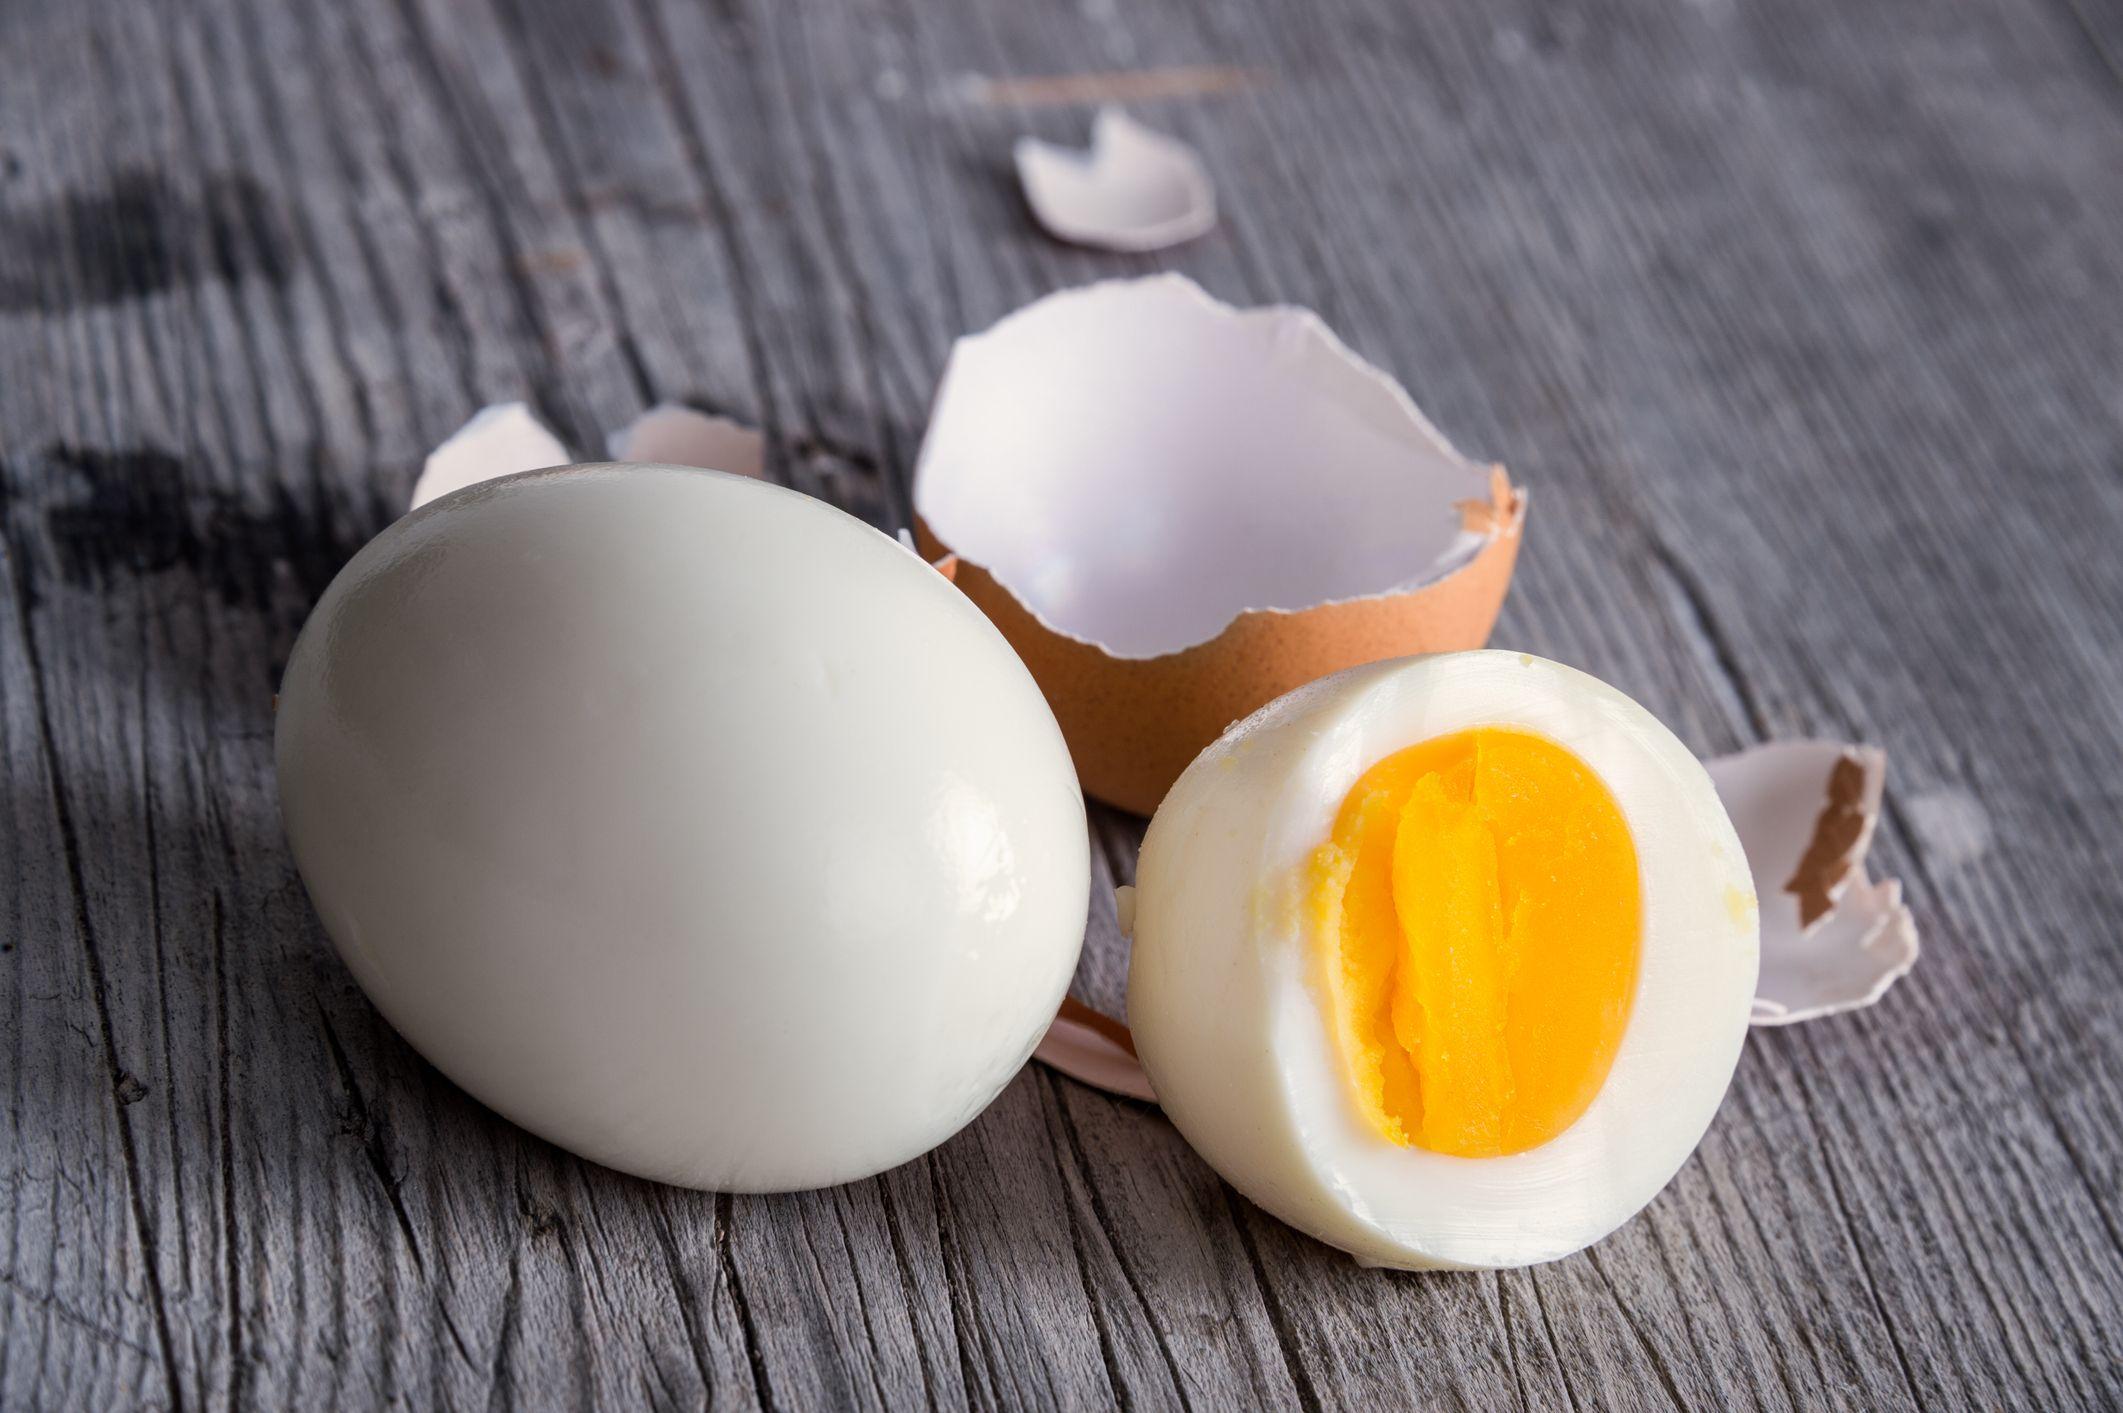 Dr  Pimple Popper Pops 'Boiled Egg' Scalp Cyst On Instagram